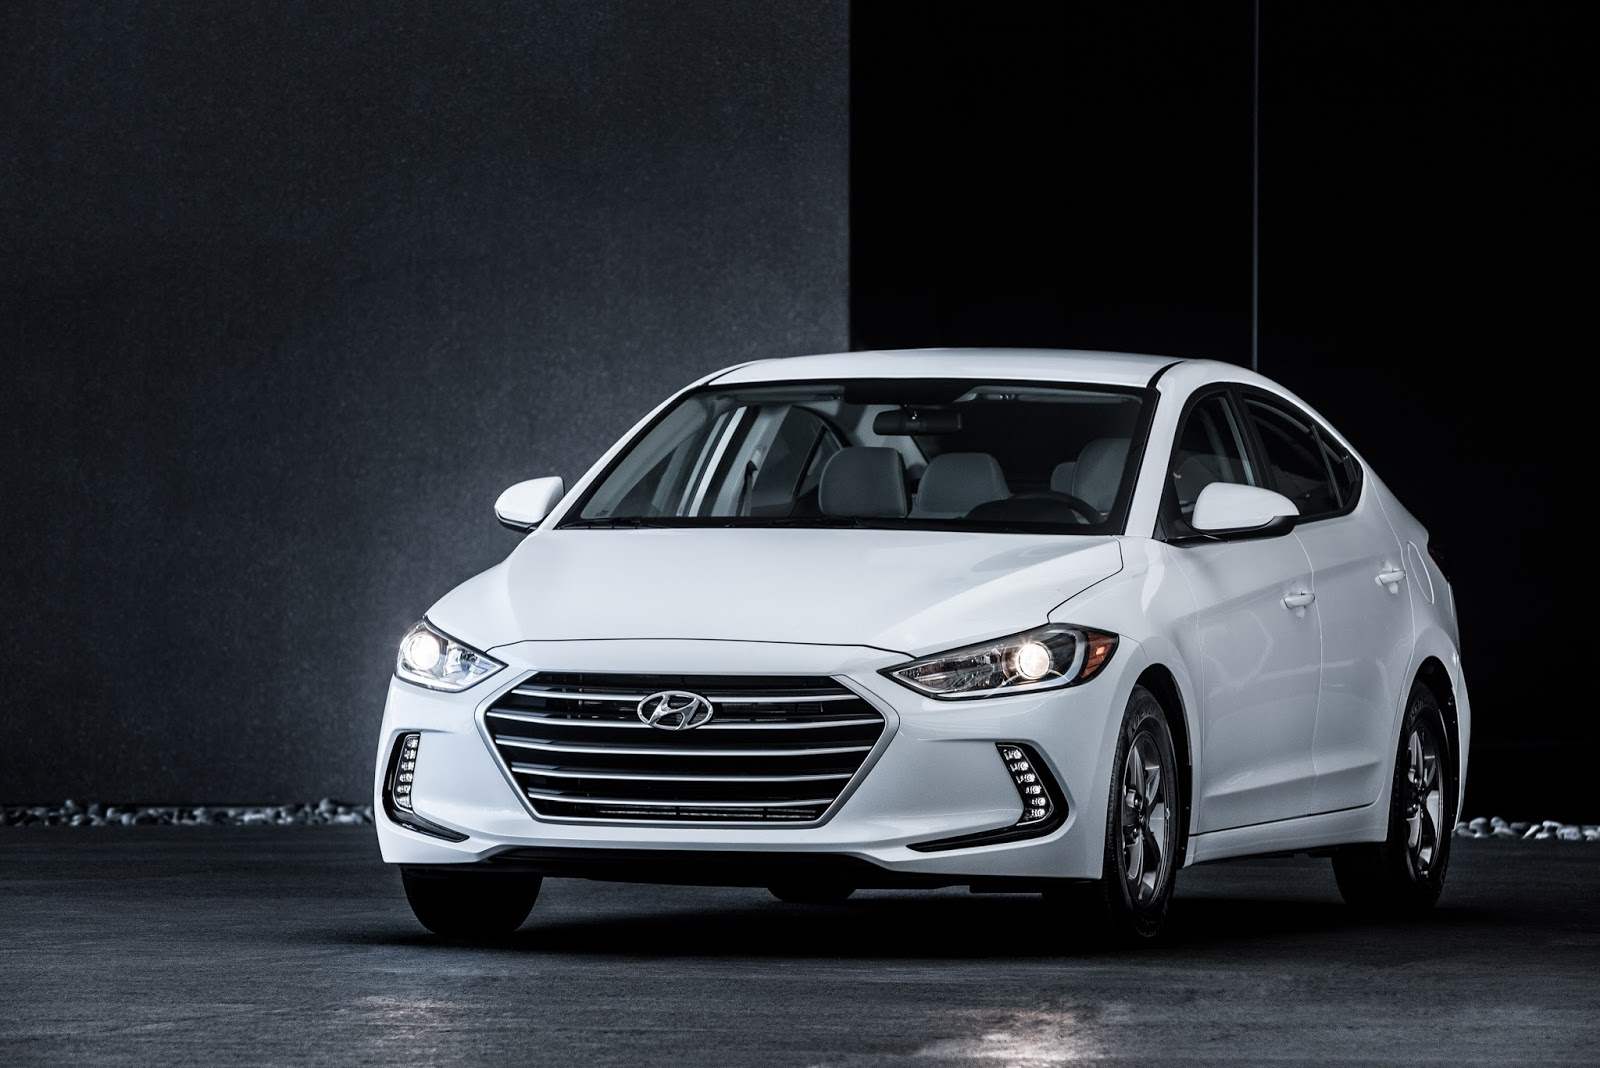 Front 3/4 view of 2017 Hyundai Elantra Eco